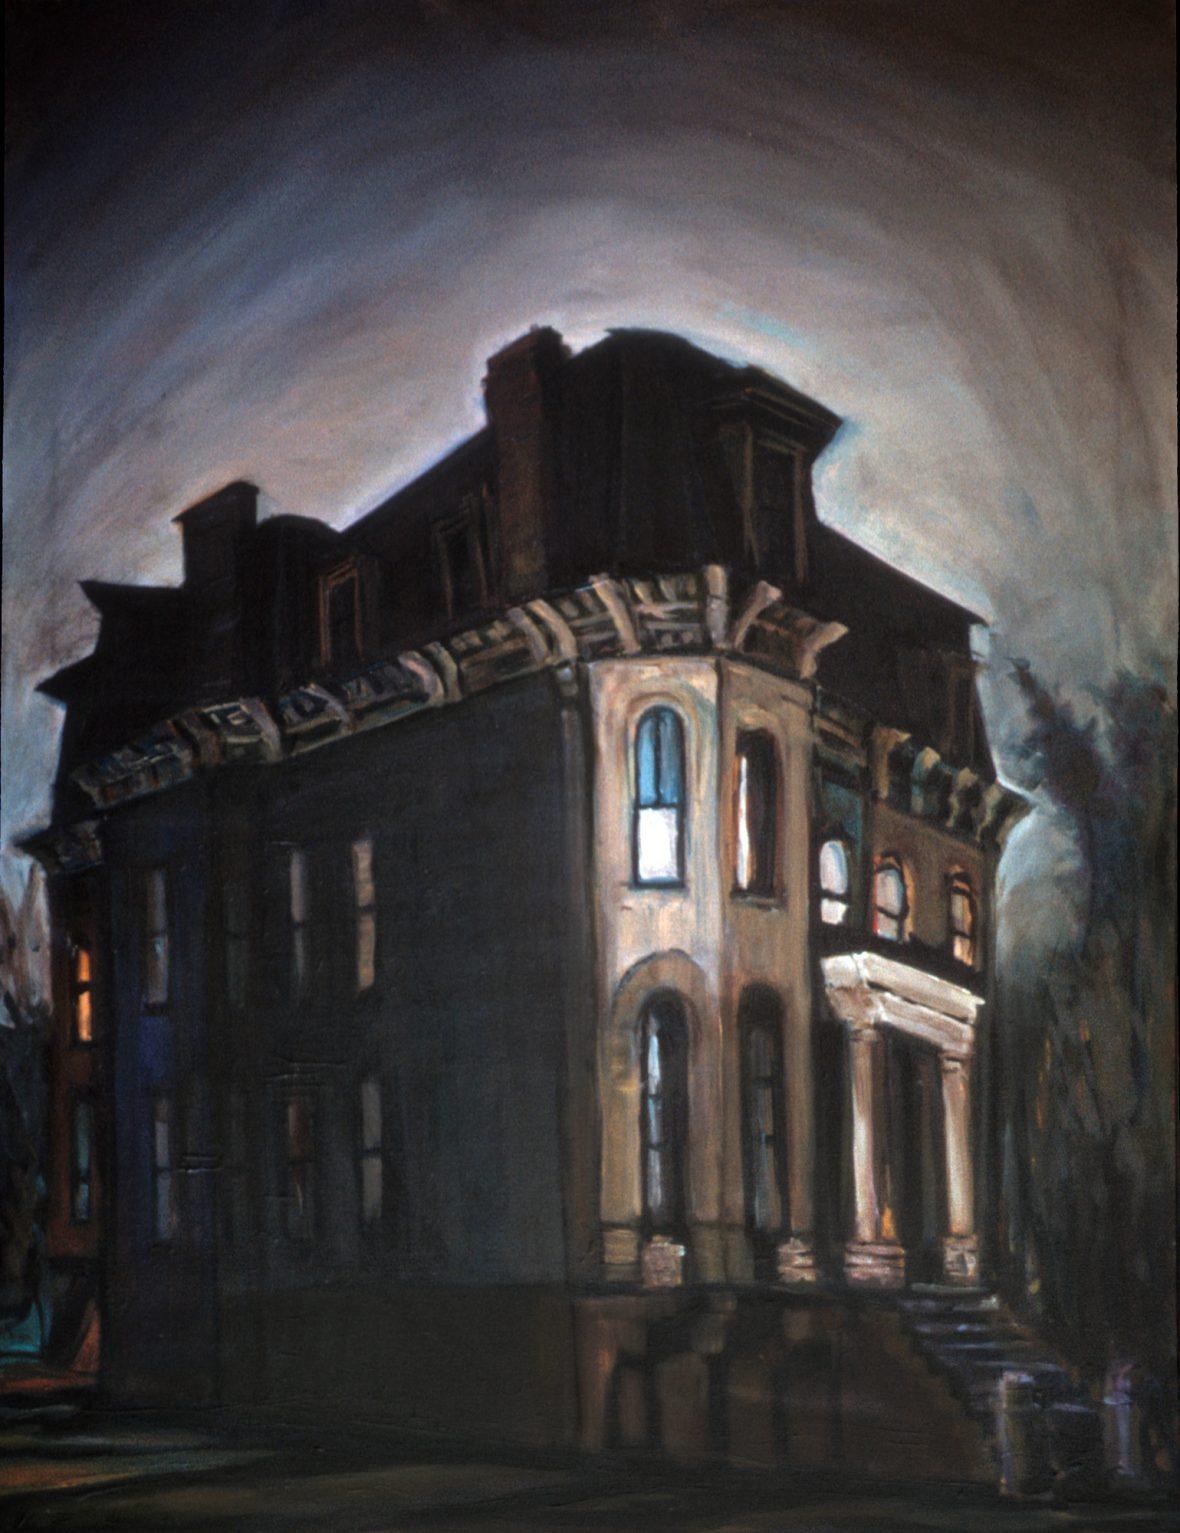 Old Mansion at Night